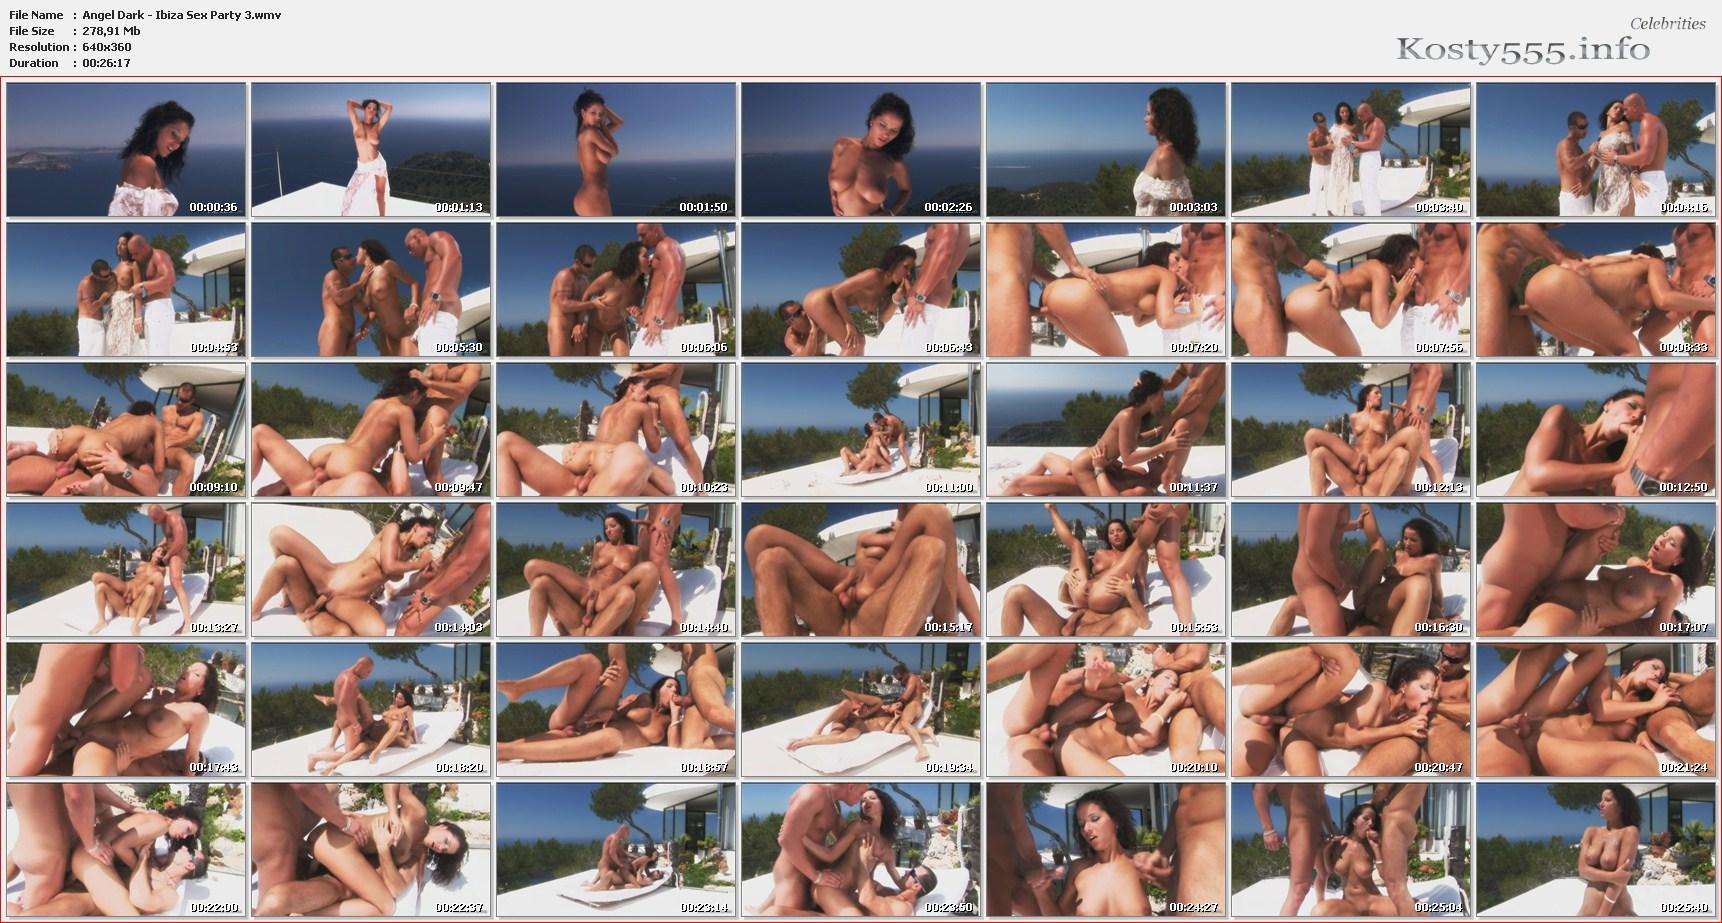 Секс вечеринка на ибице 13 фотография